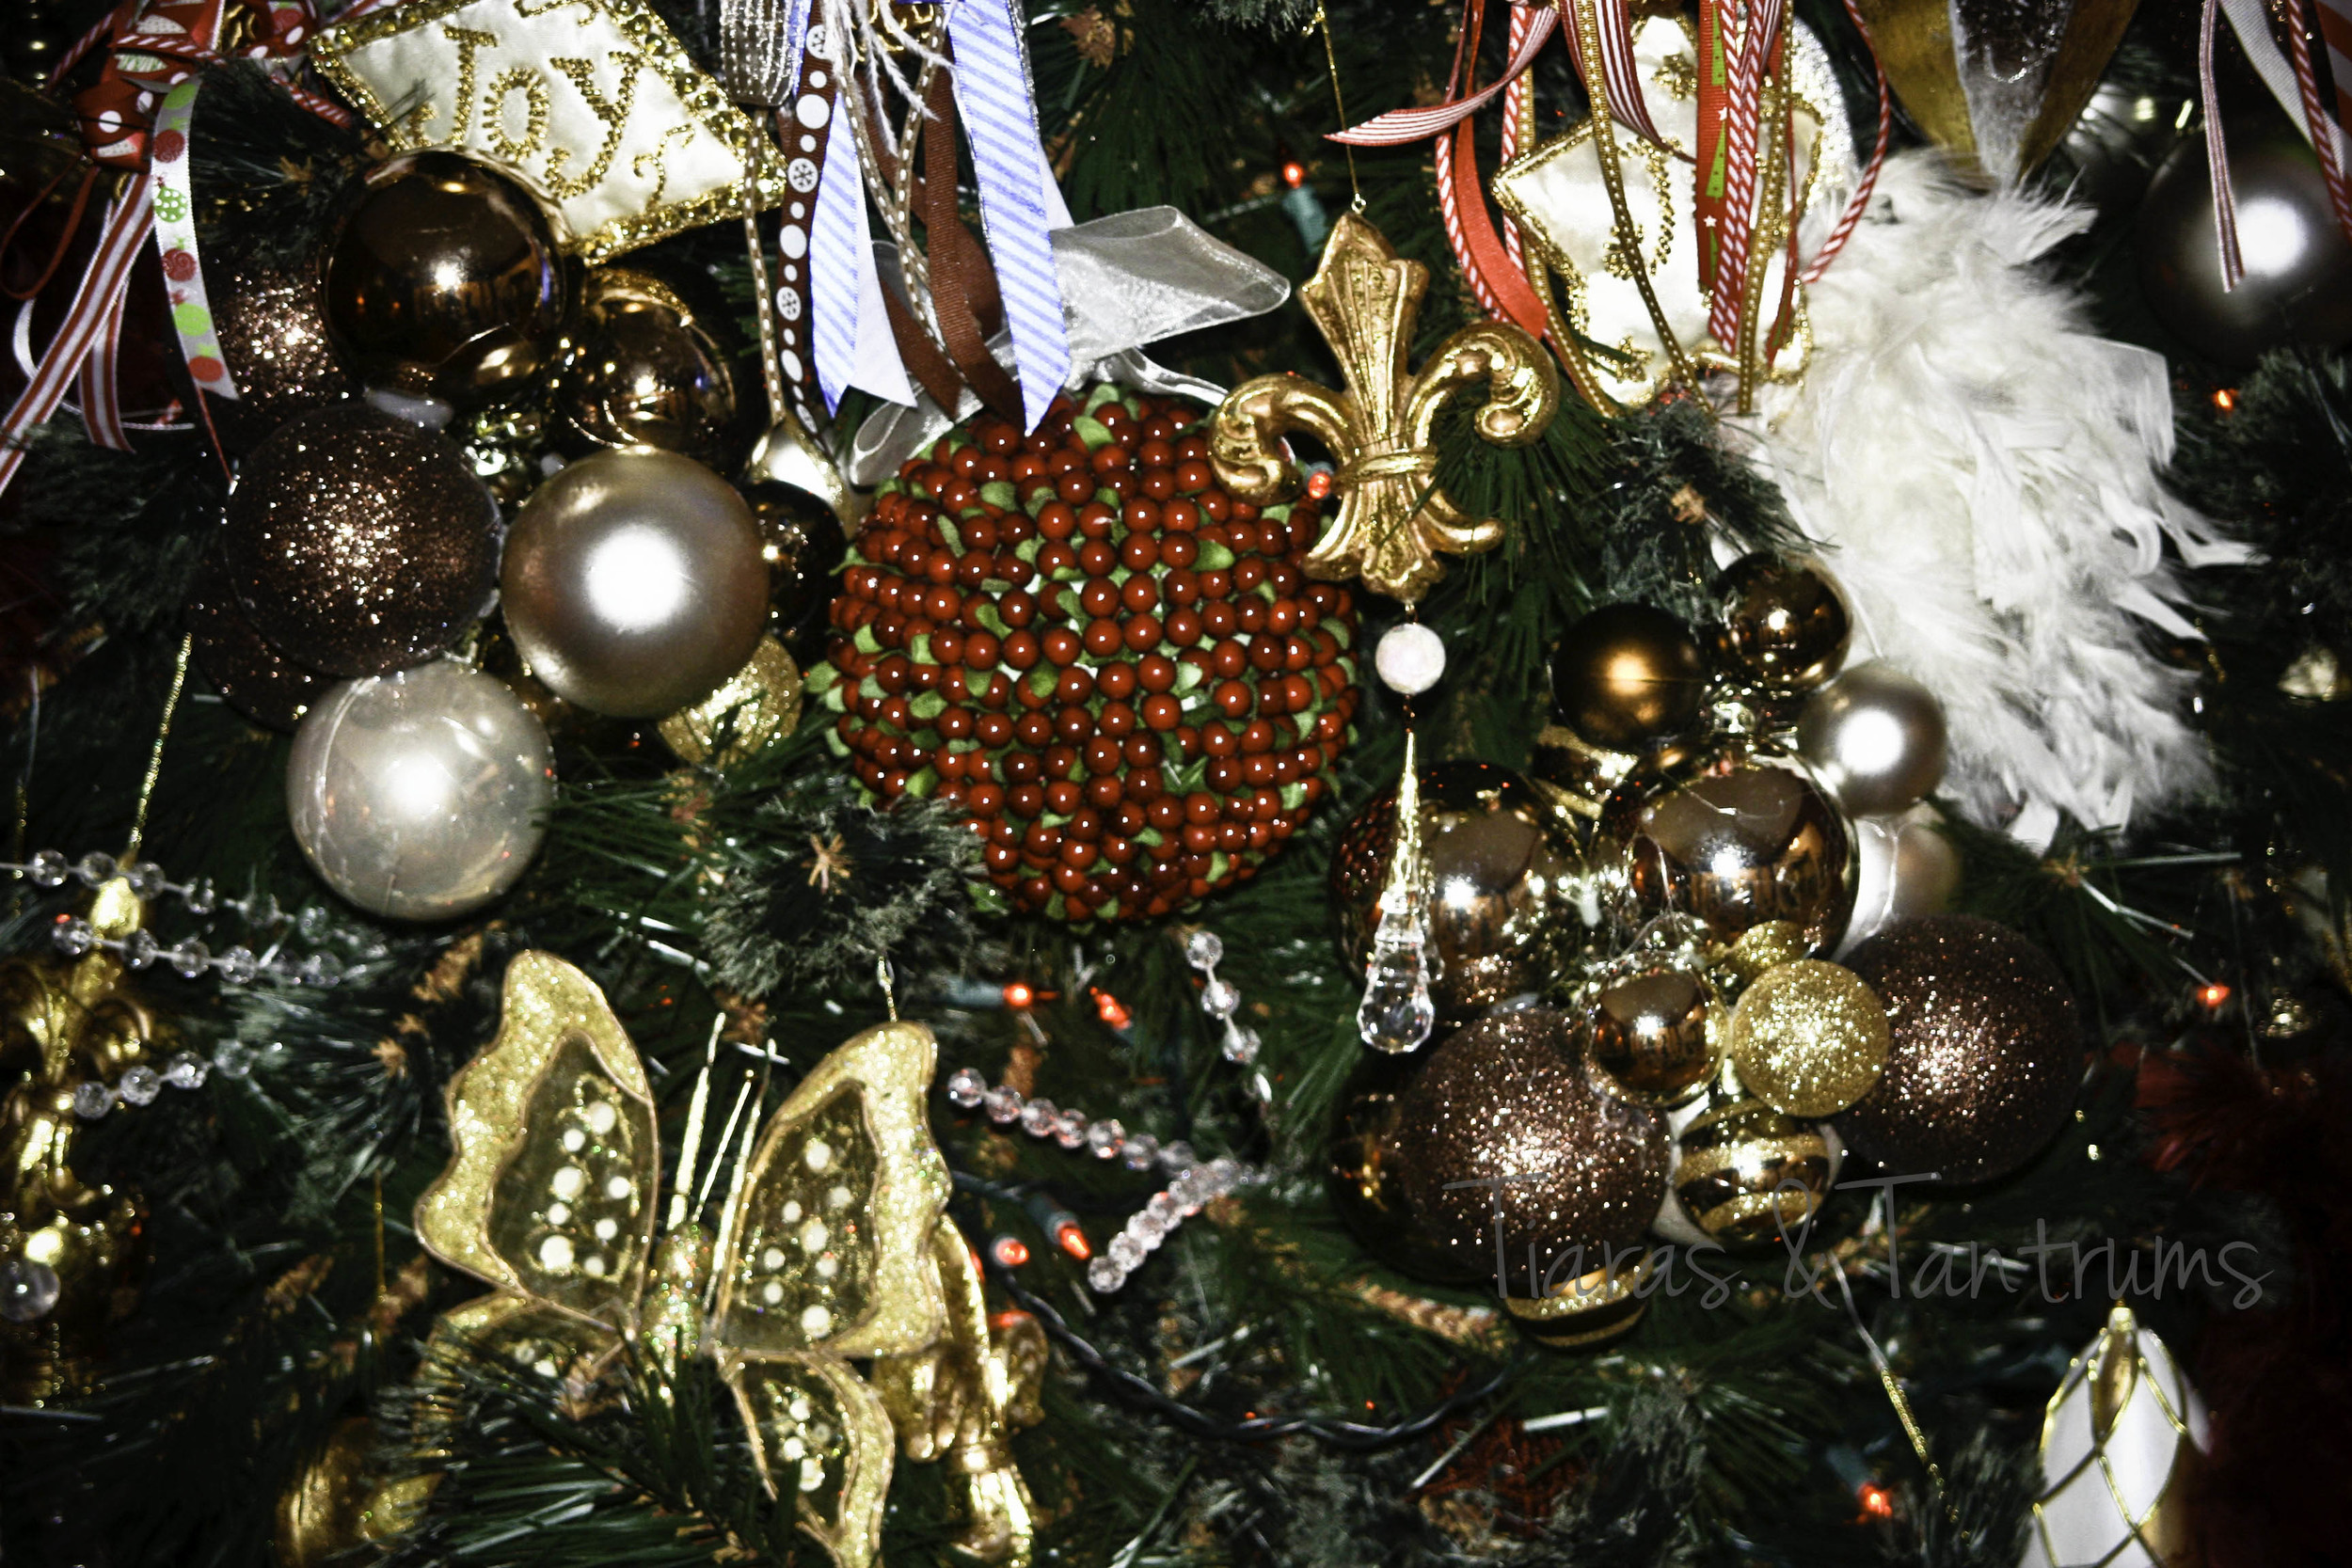 ornaments-4.JPG